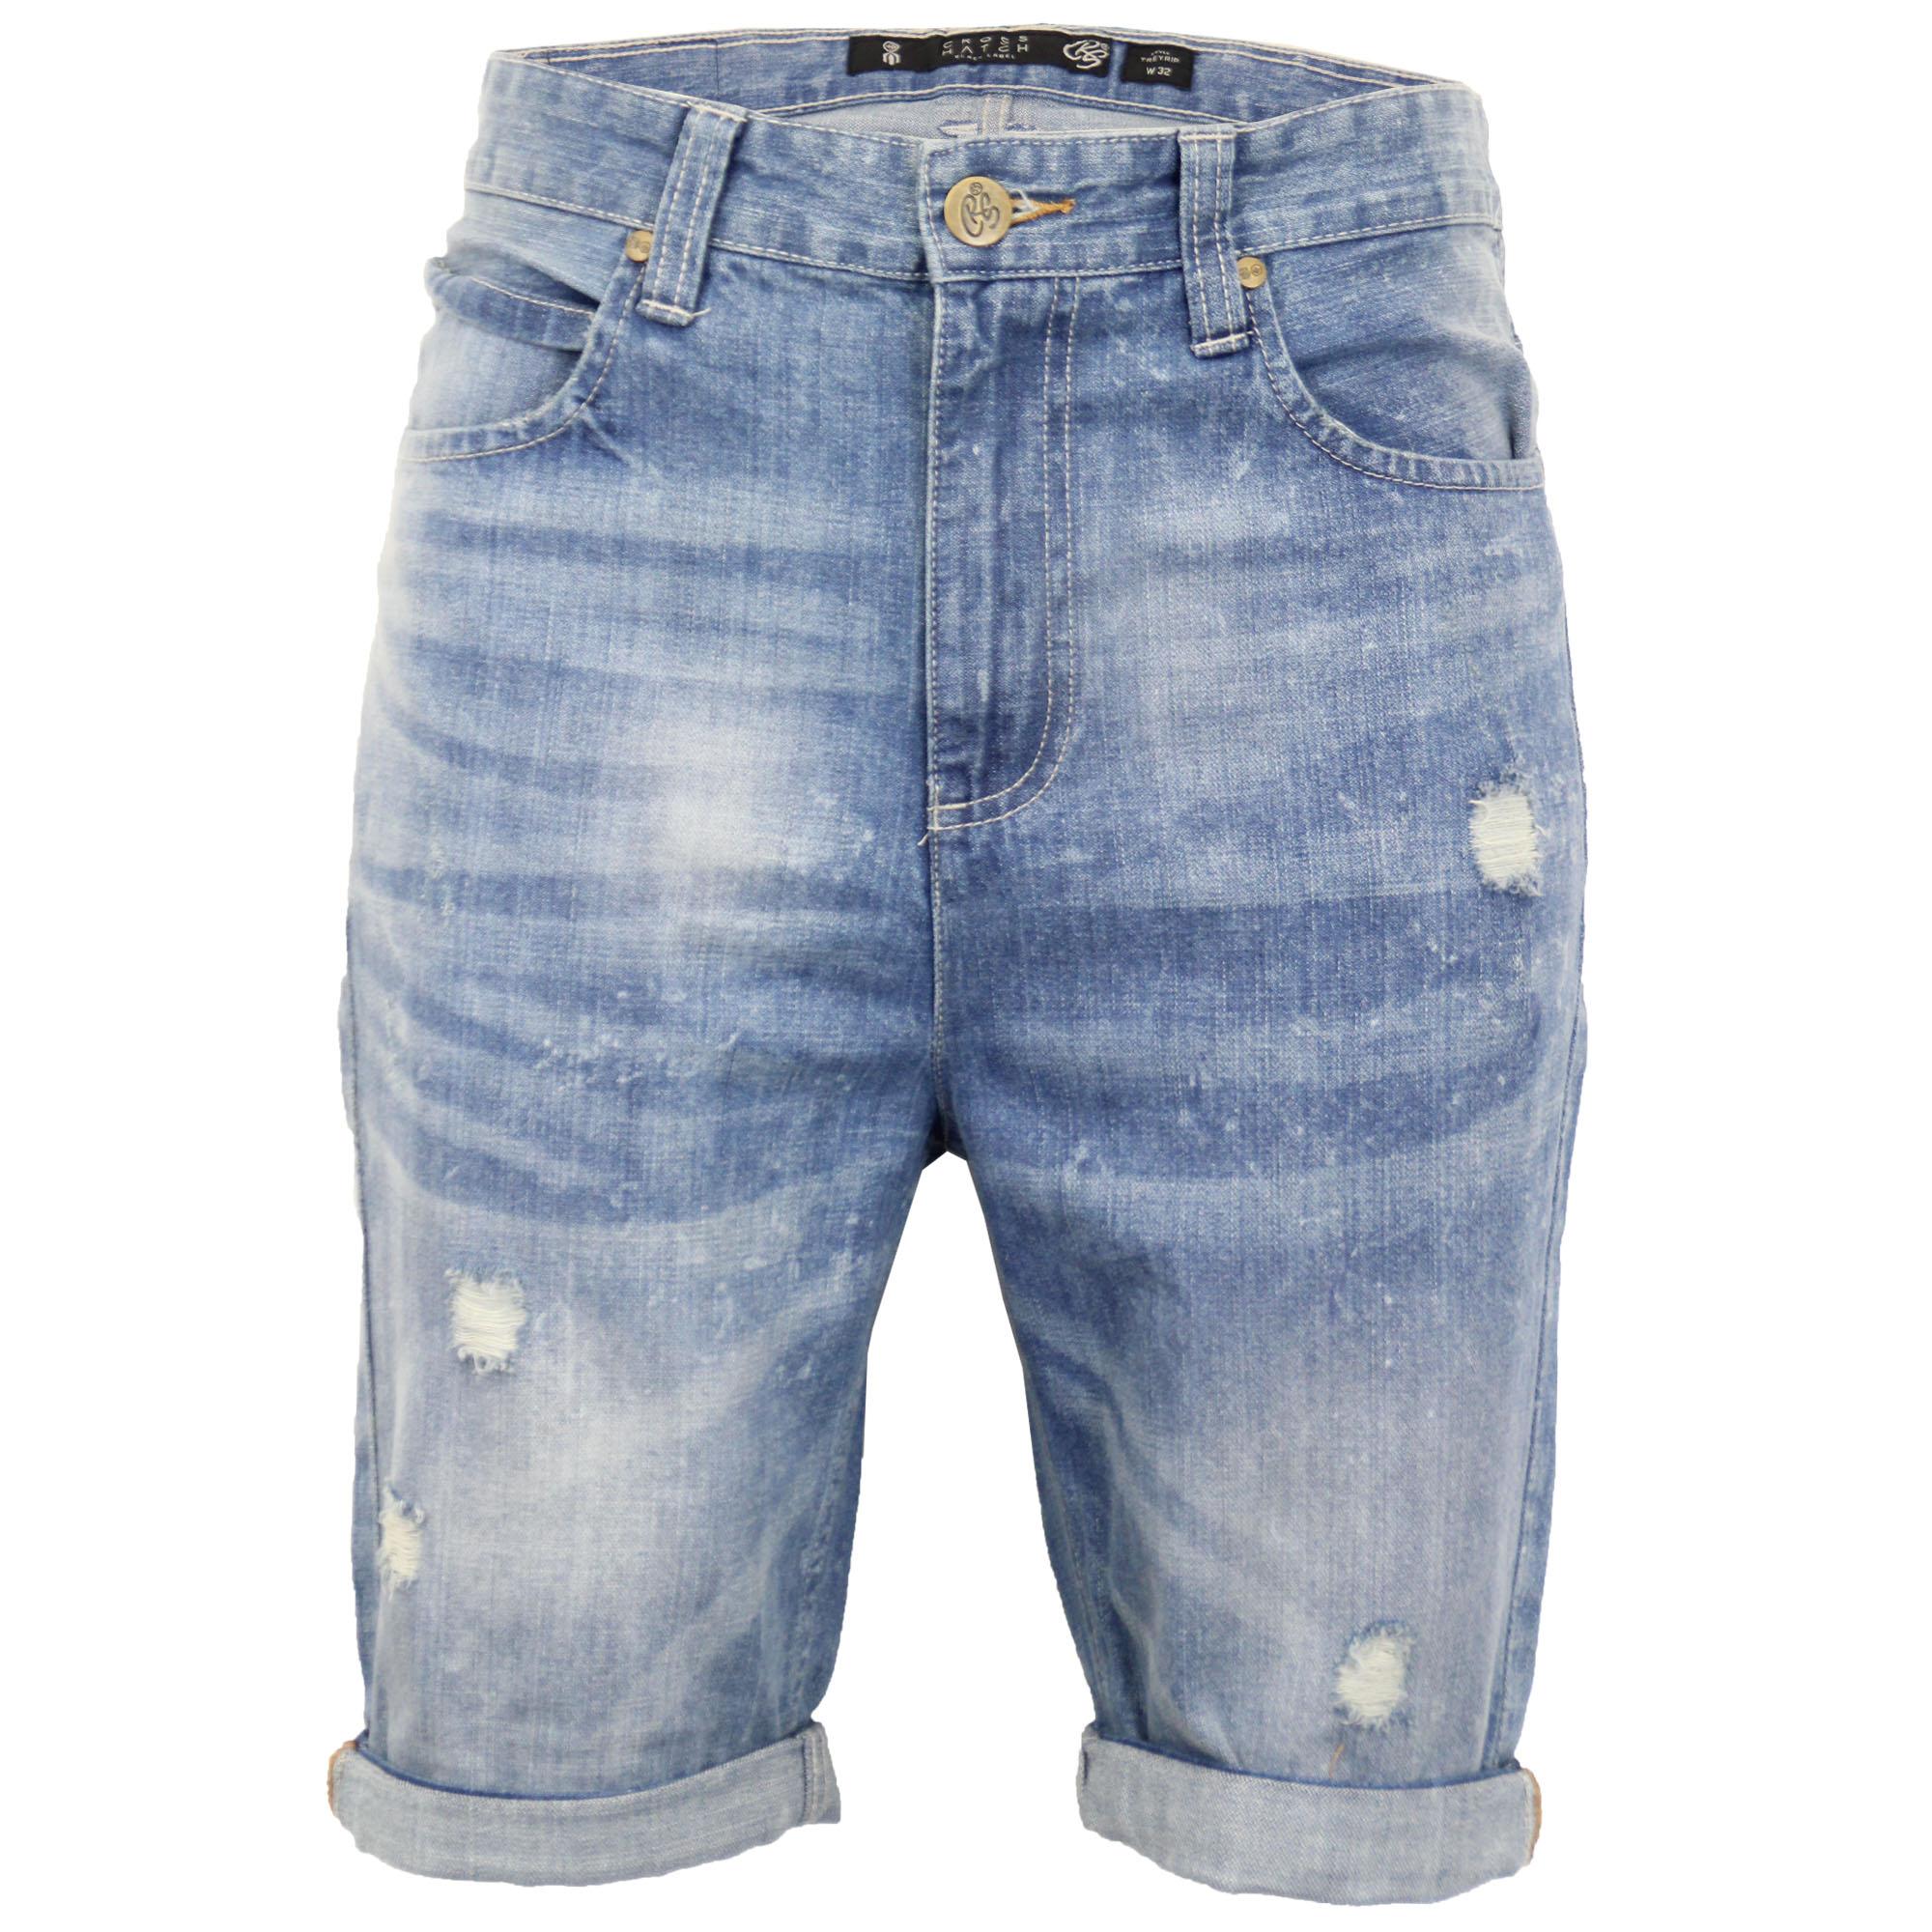 Mens-Crosshatch-Denim-Knee-Length-Combat-Shorts-Cargo-Casual-Fashion-Summer-New 縮圖 48